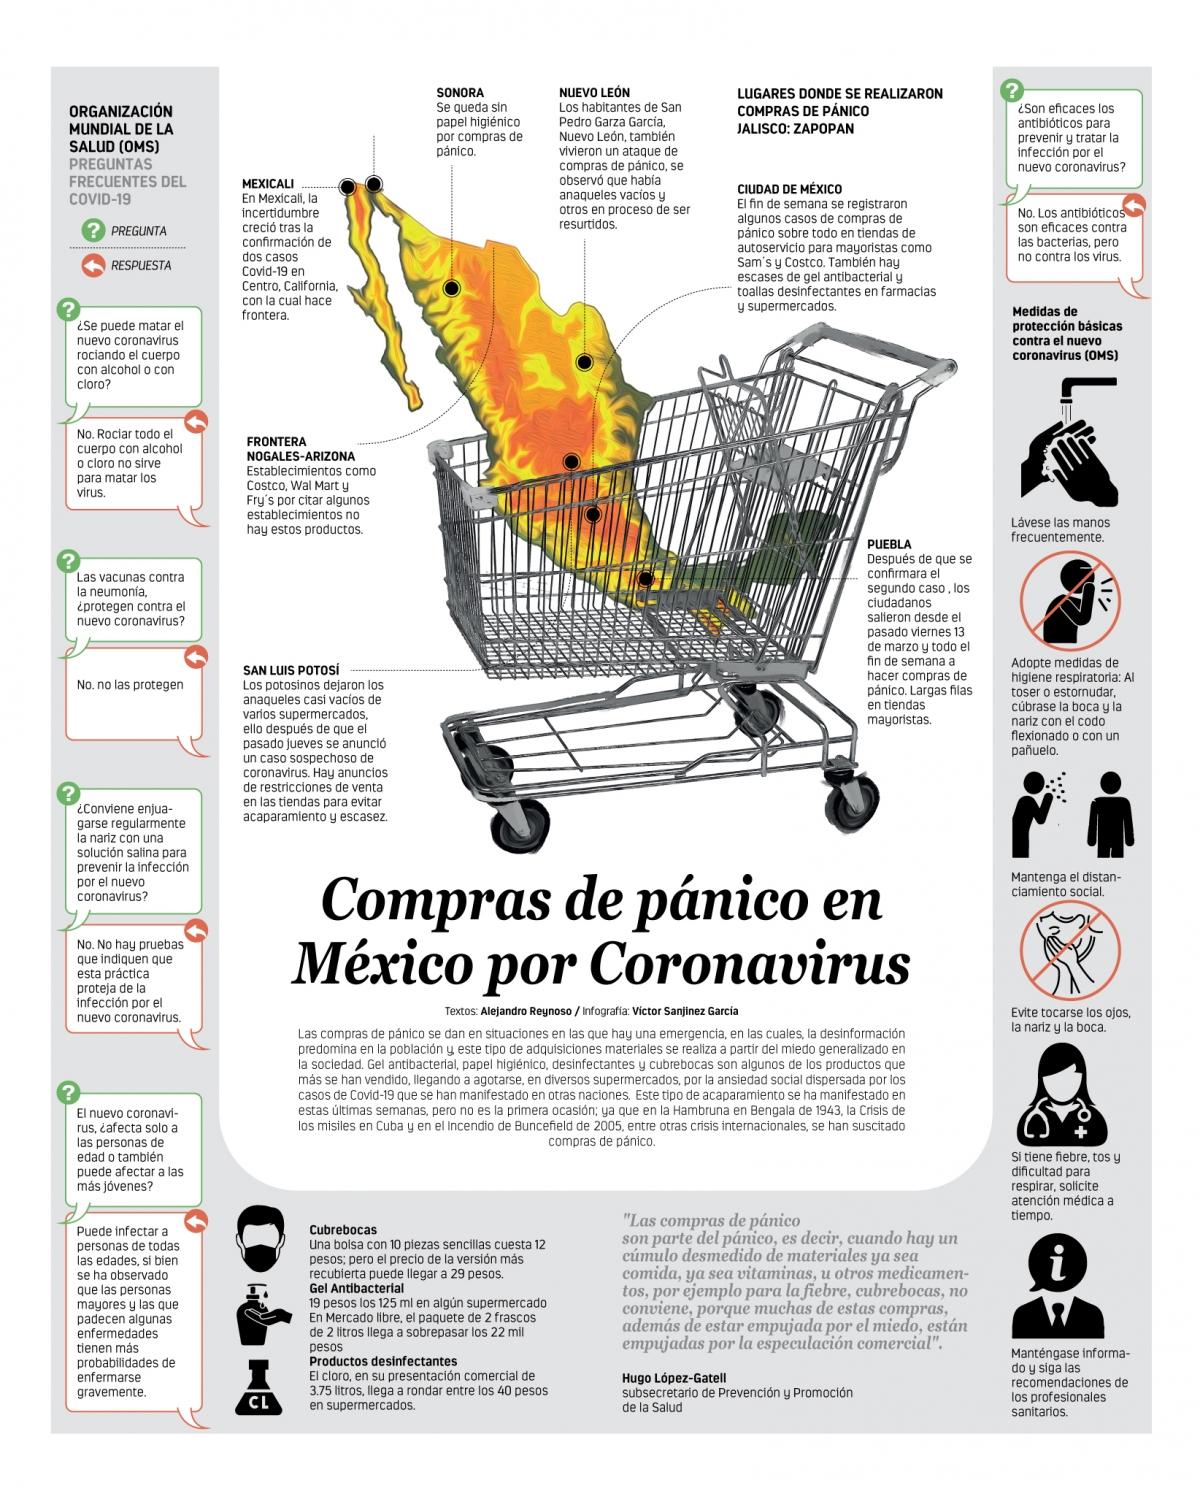 Compras de pánico por Coronavirus